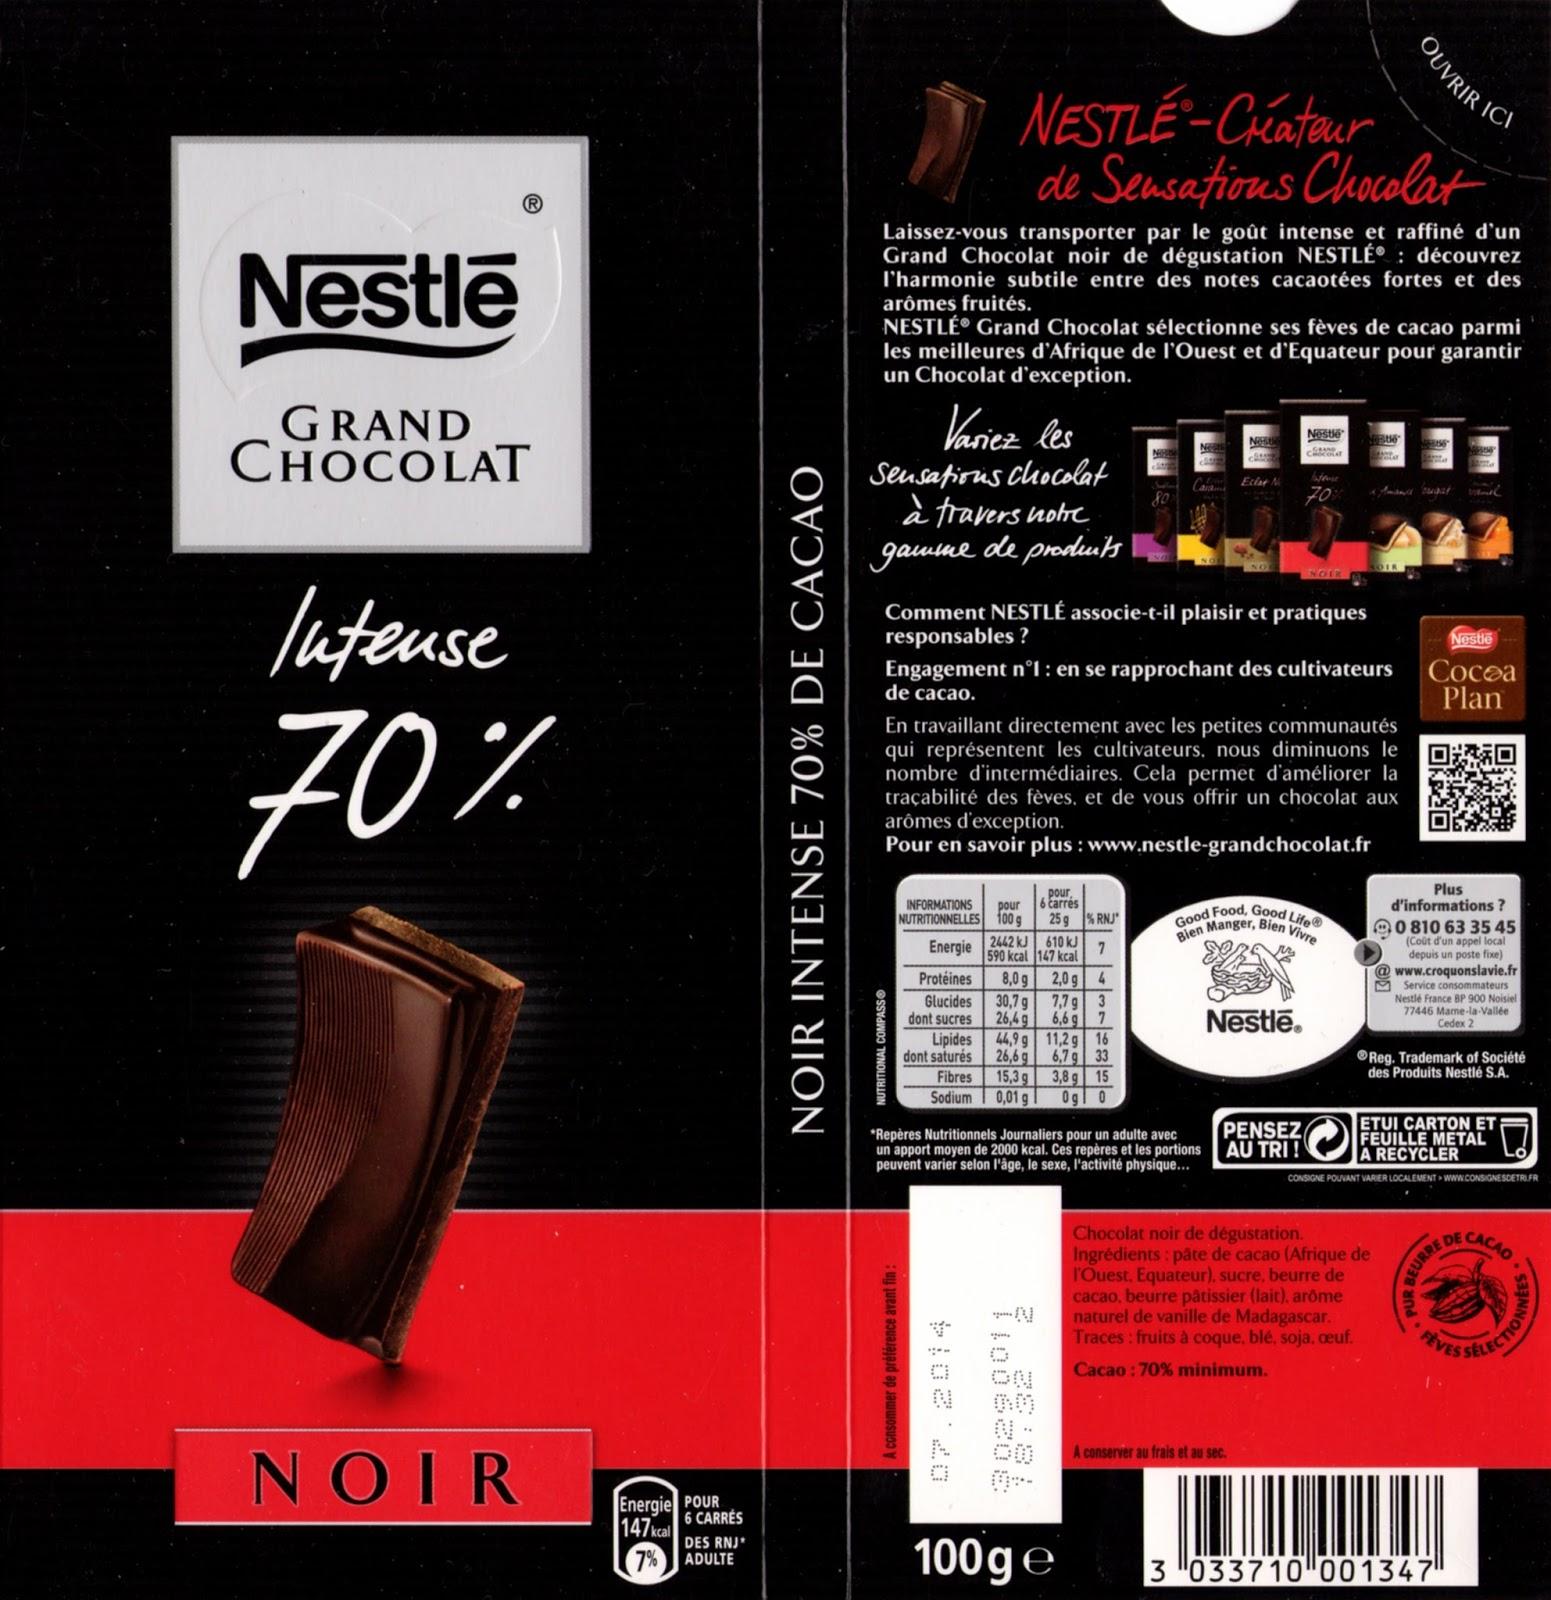 nestl233 grand chocolat intense 70 tablette de choc